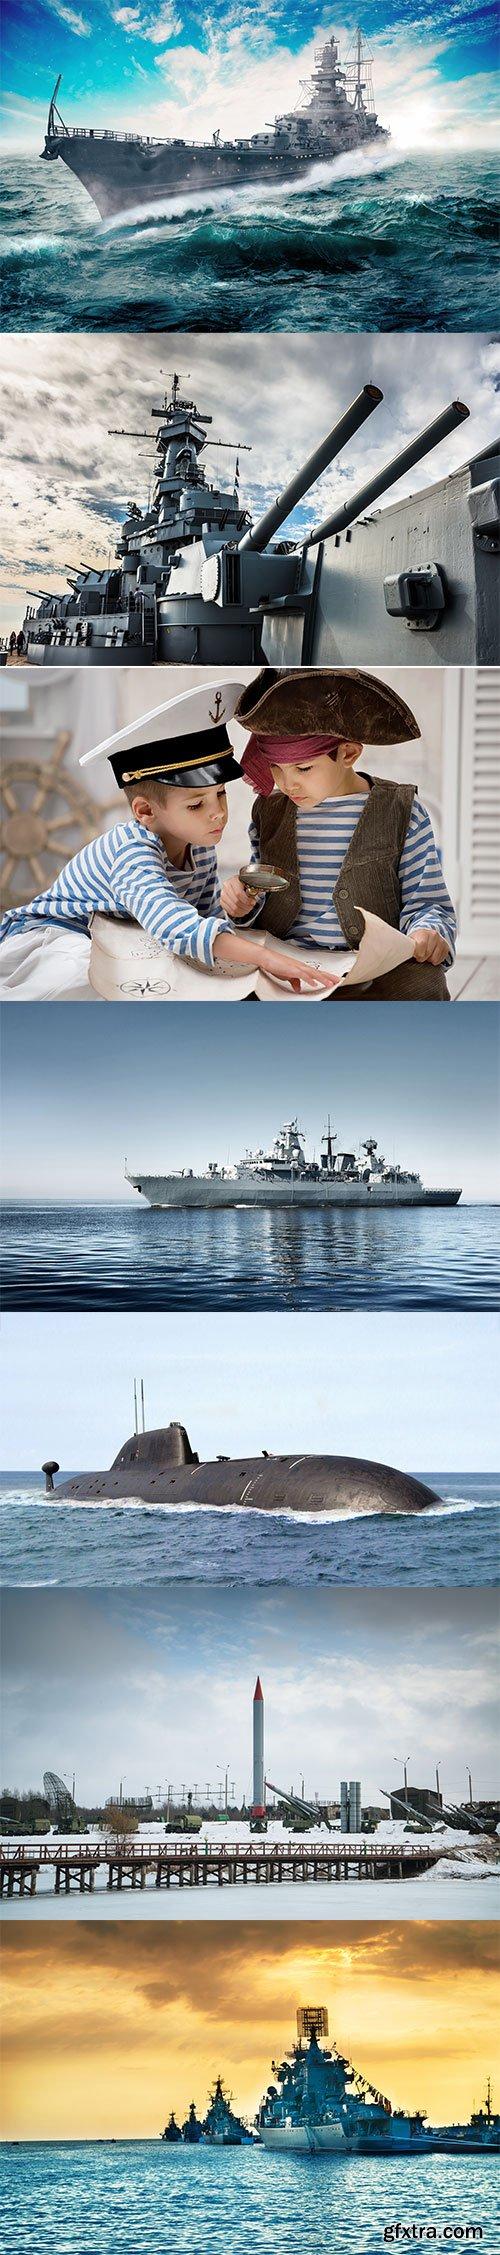 Photo - Battle Ship - 10xJPGs